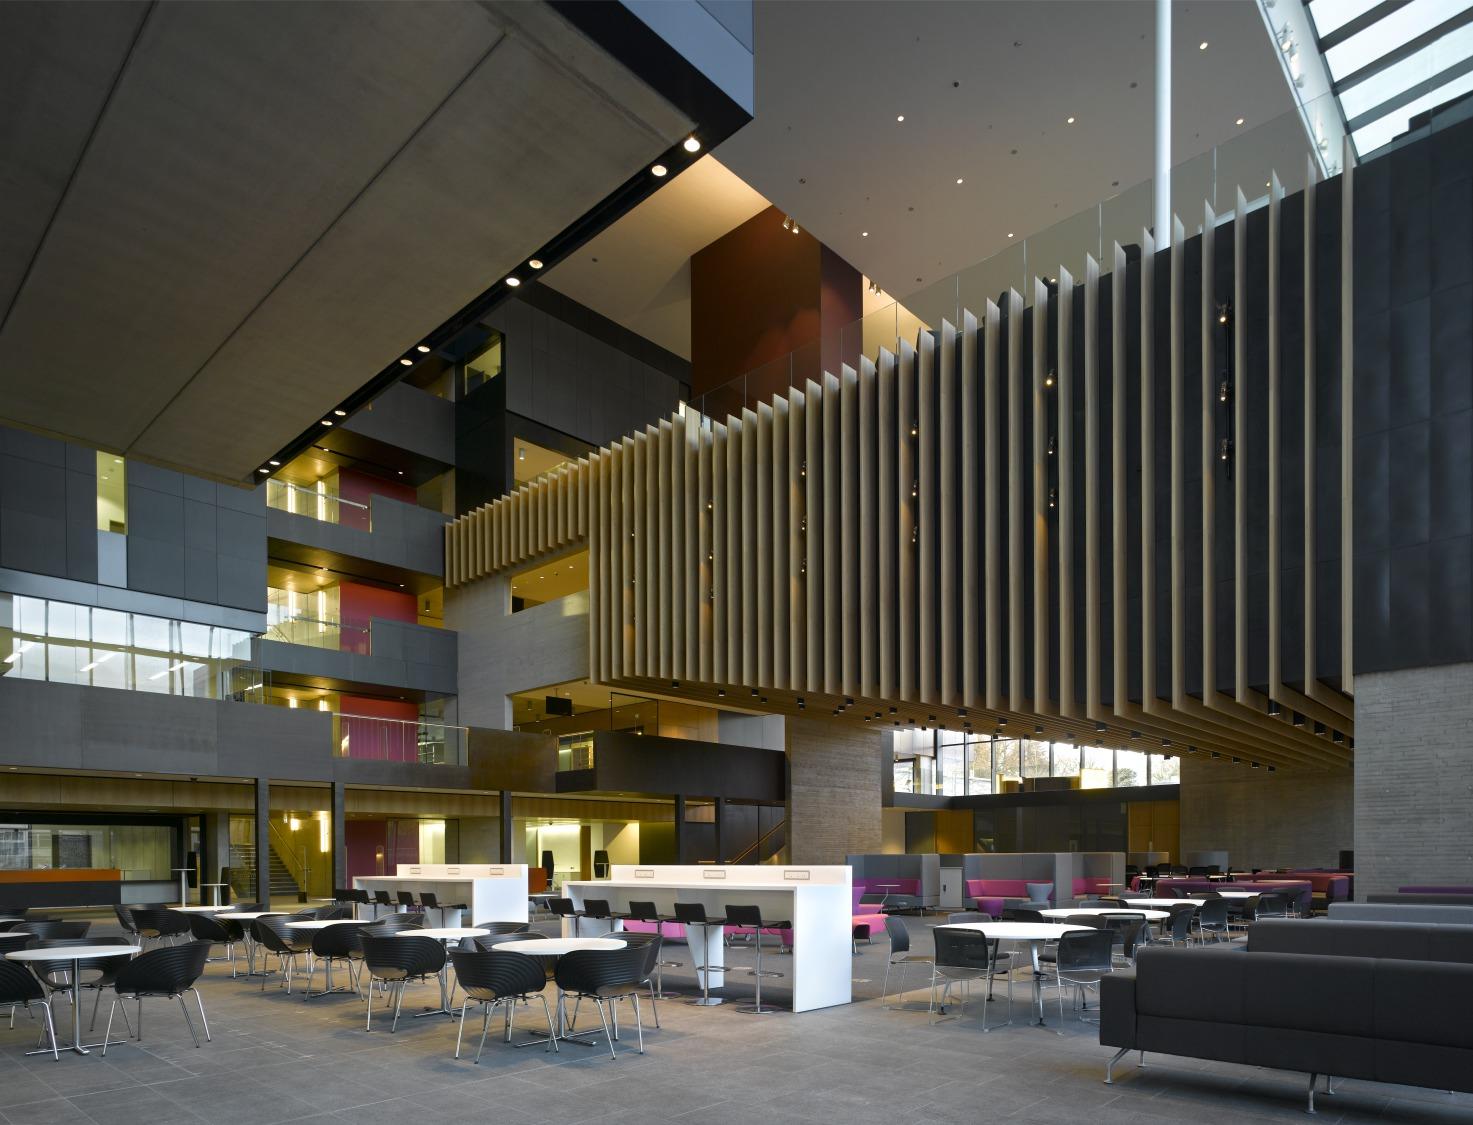 John Henry Brookes Building Oxford Brookes University